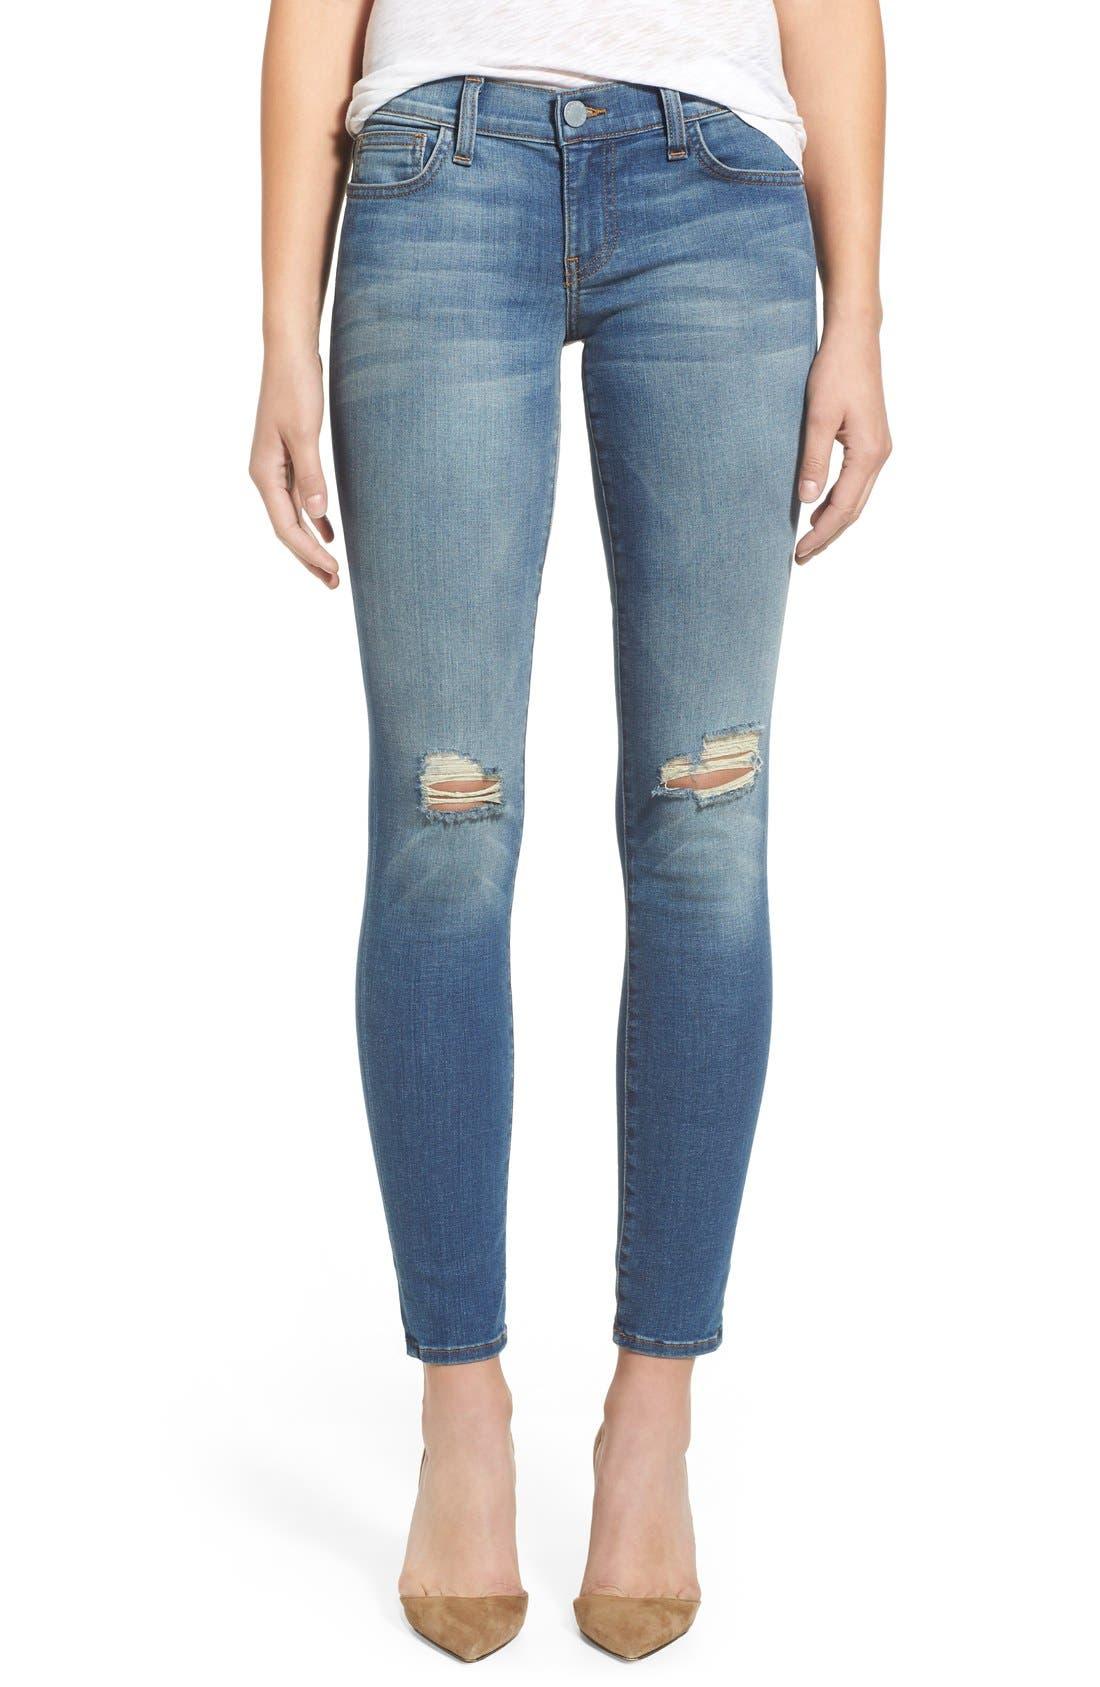 REBECCA MINKOFF, 'Jane' Skinny Jeans, Main thumbnail 1, color, 400